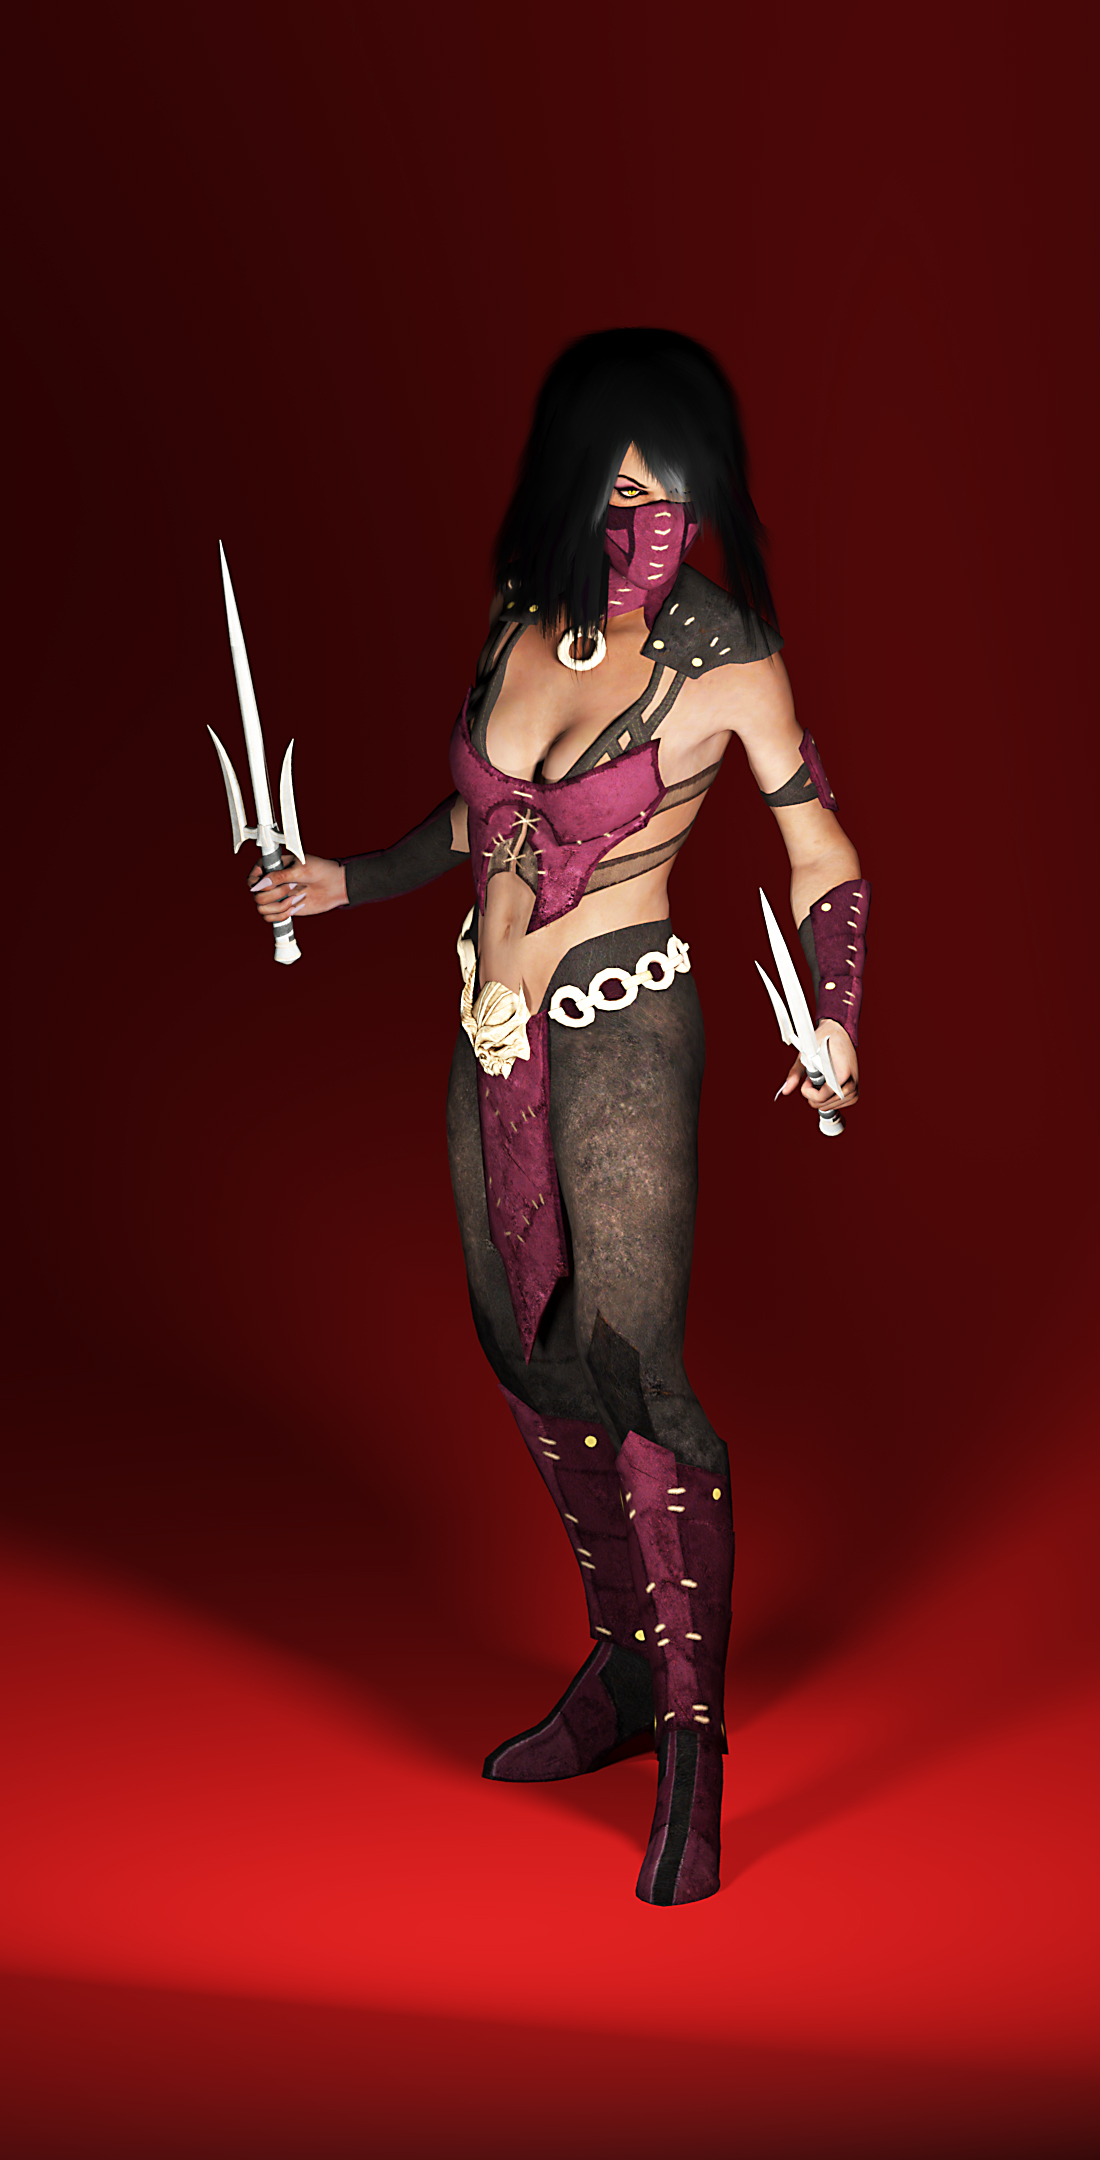 MKX Kahnum Mileena   Fictional characters, Deviantart